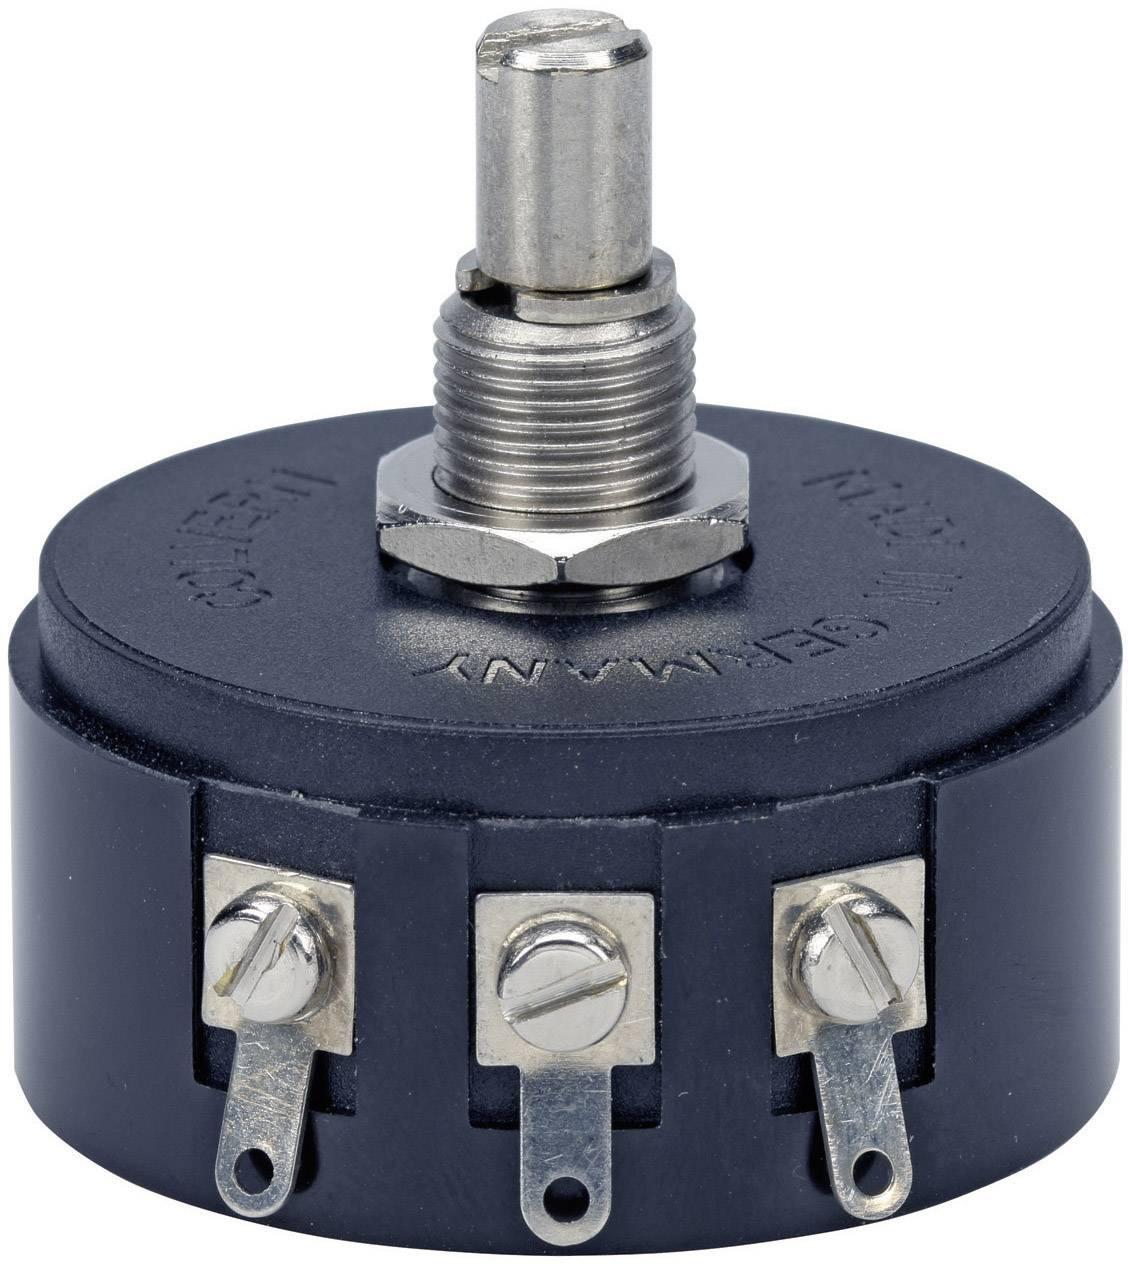 Drôtový potenciometer mono TT Electronics AB 3104001180 3104001180, 3 W, 25 kOhm, 1 ks